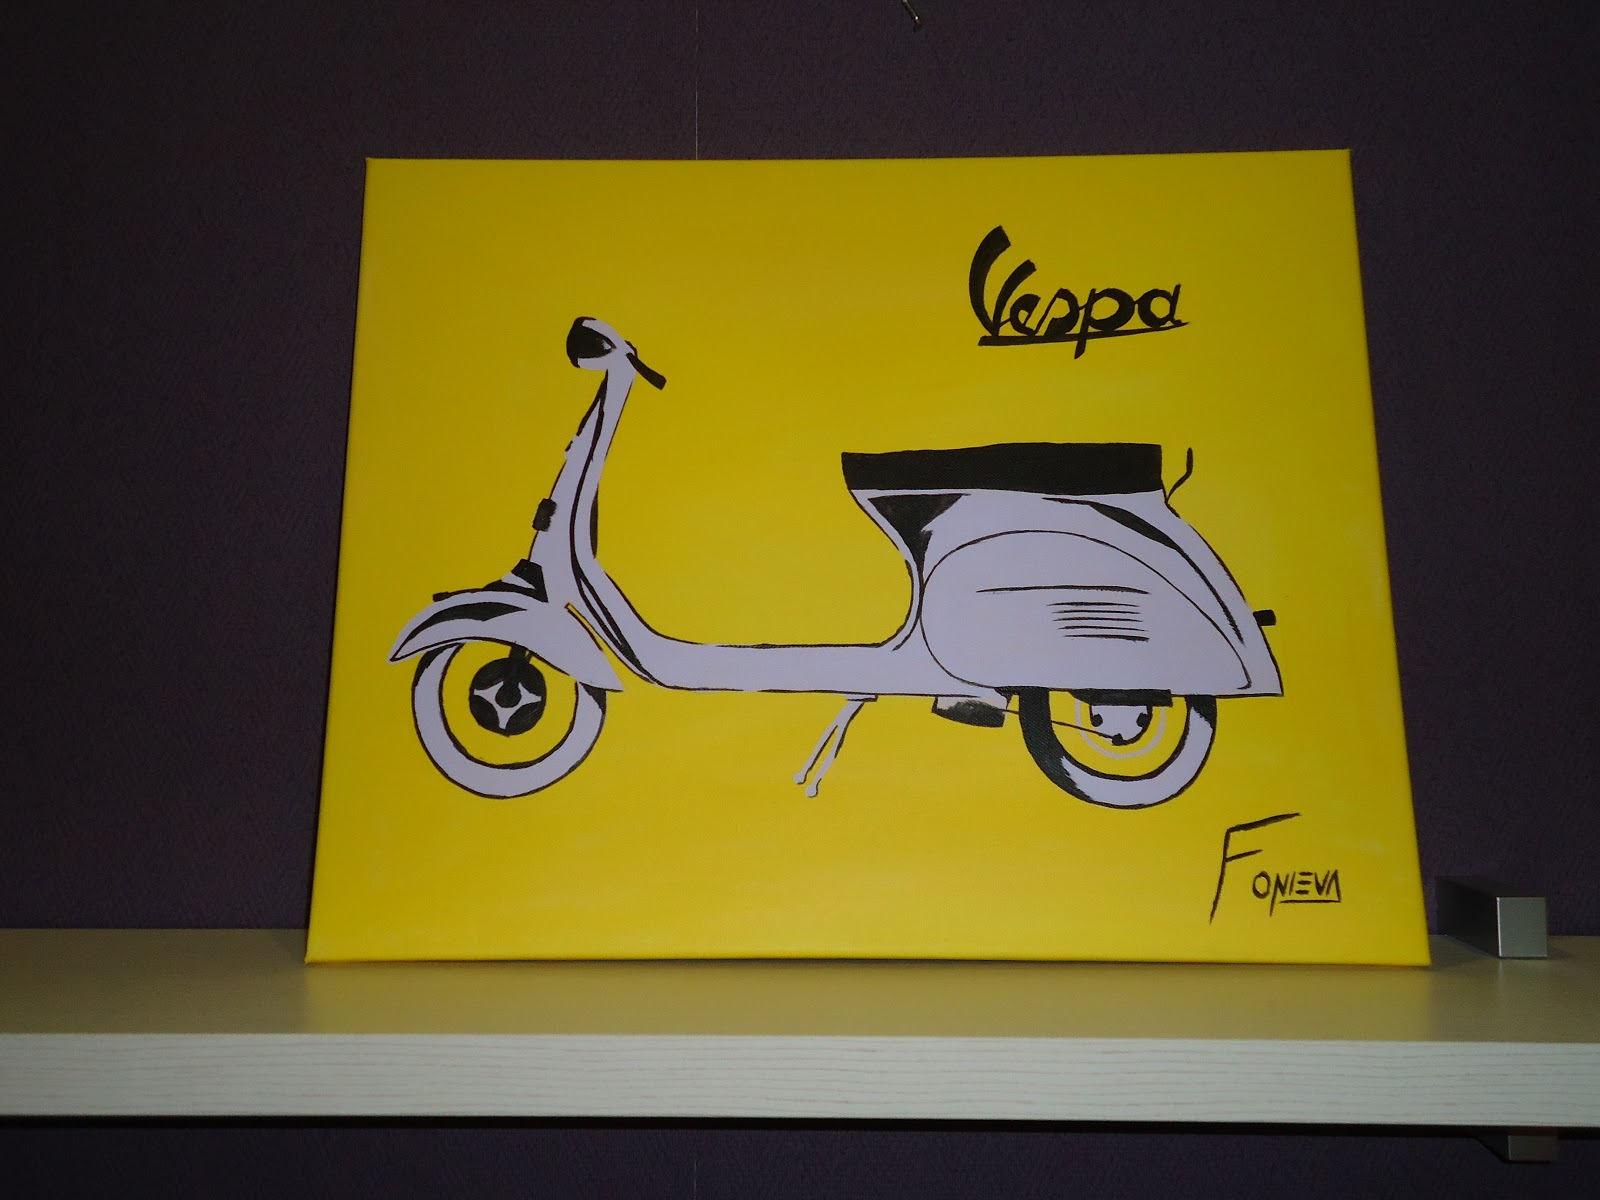 Cuadros fran onieva pop art - Cuadros pop art comic ...